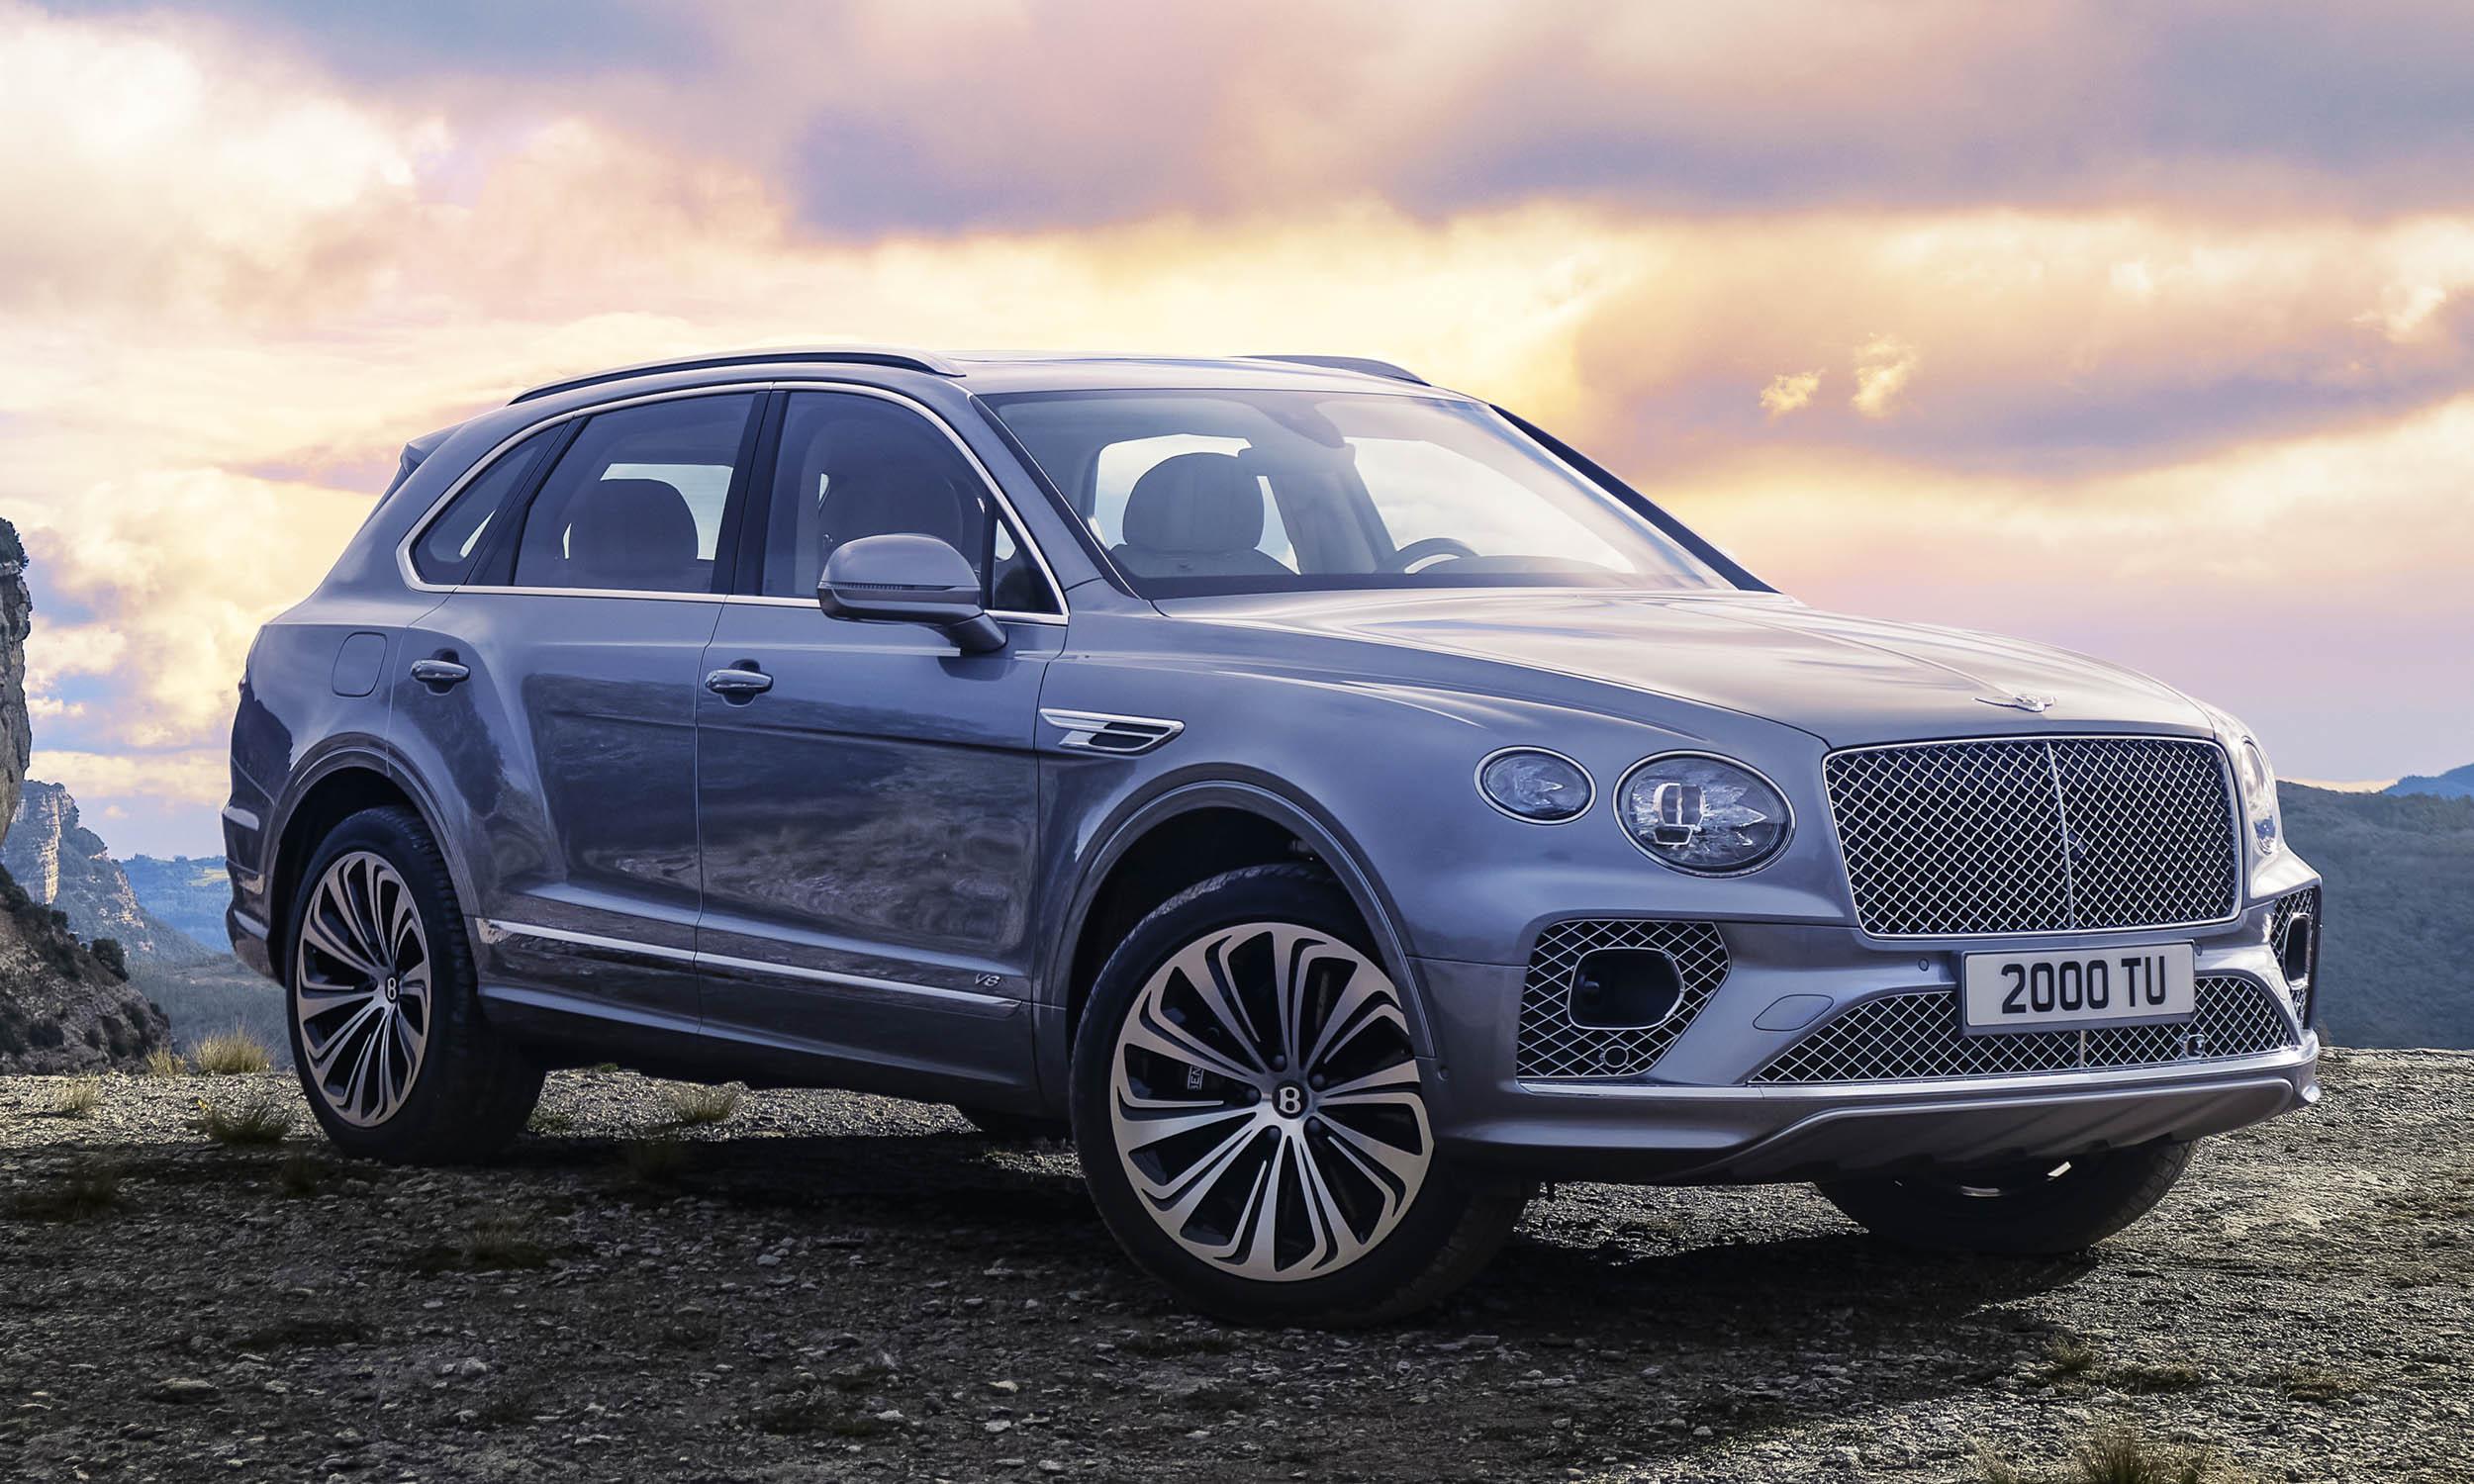 2021 Bentley Bentayga: First Look